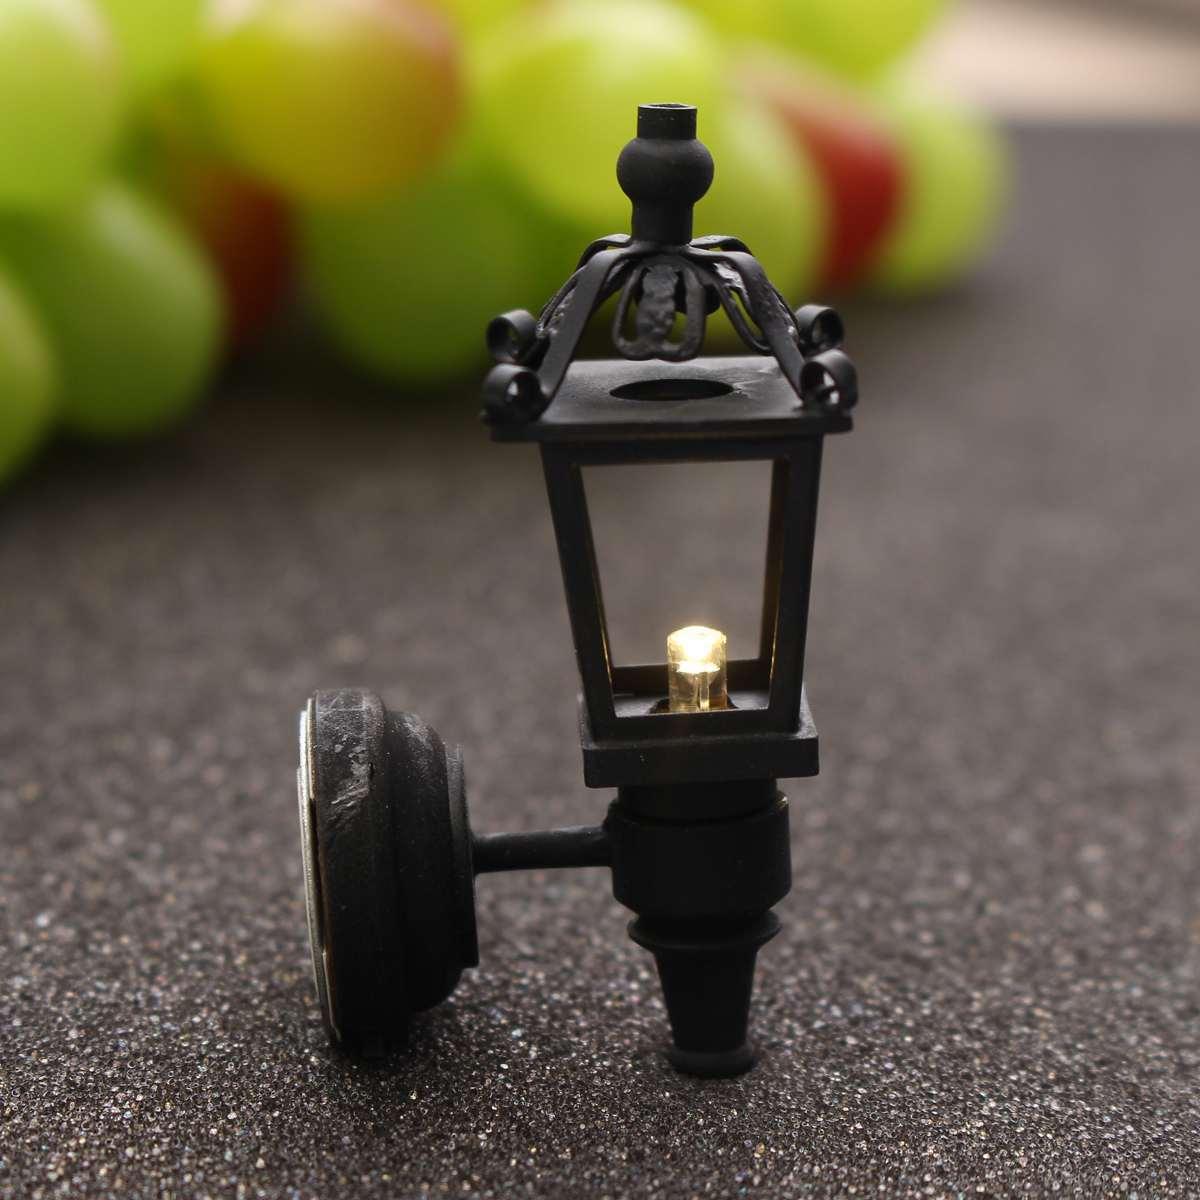 2pcs Miniatura Streetlight LED Electronic Toys Landscape For Doll House Accessories Simulation Miniature LED Wall Light Model